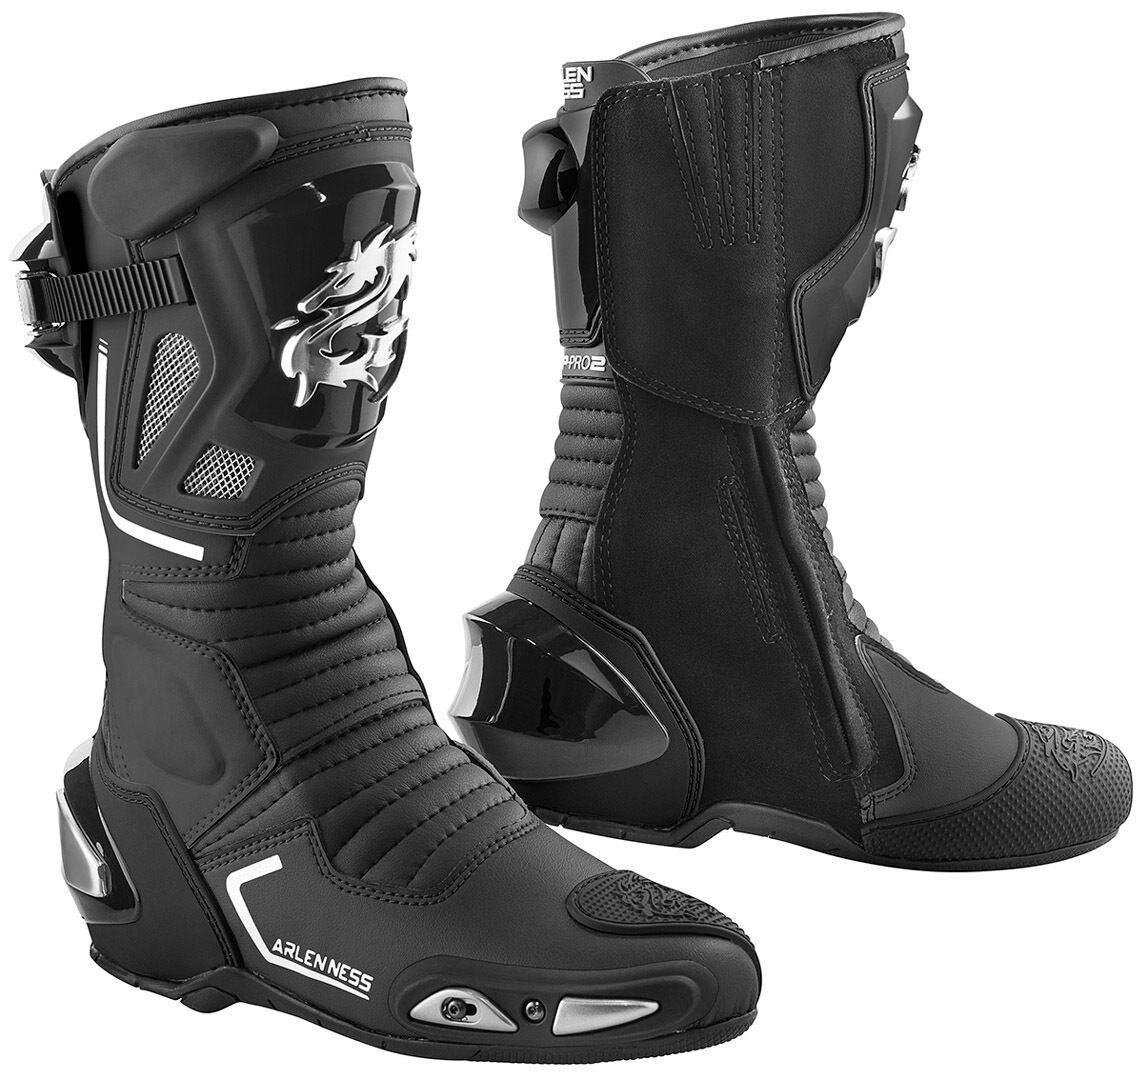 Arlen Ness Sugello Bottes de moto Noir taille : 37